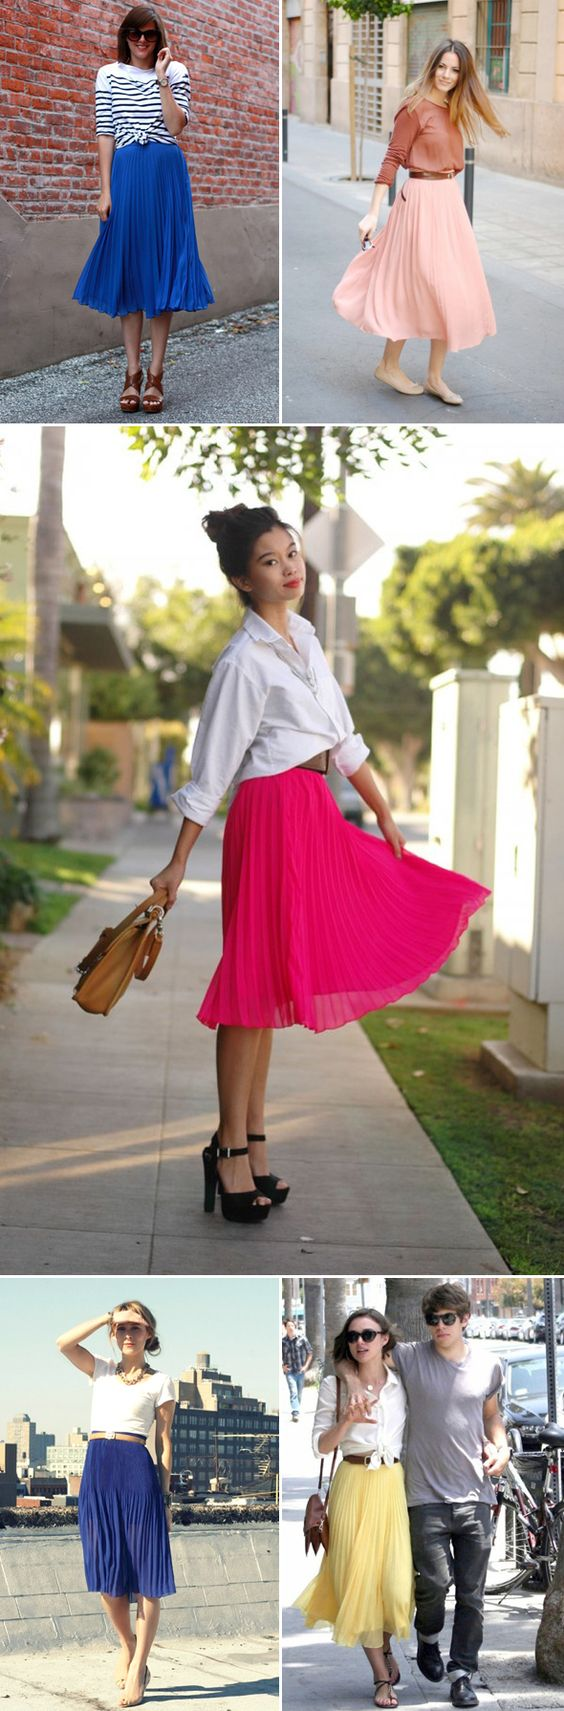 Pleat skirts via The Style Umbrella blog